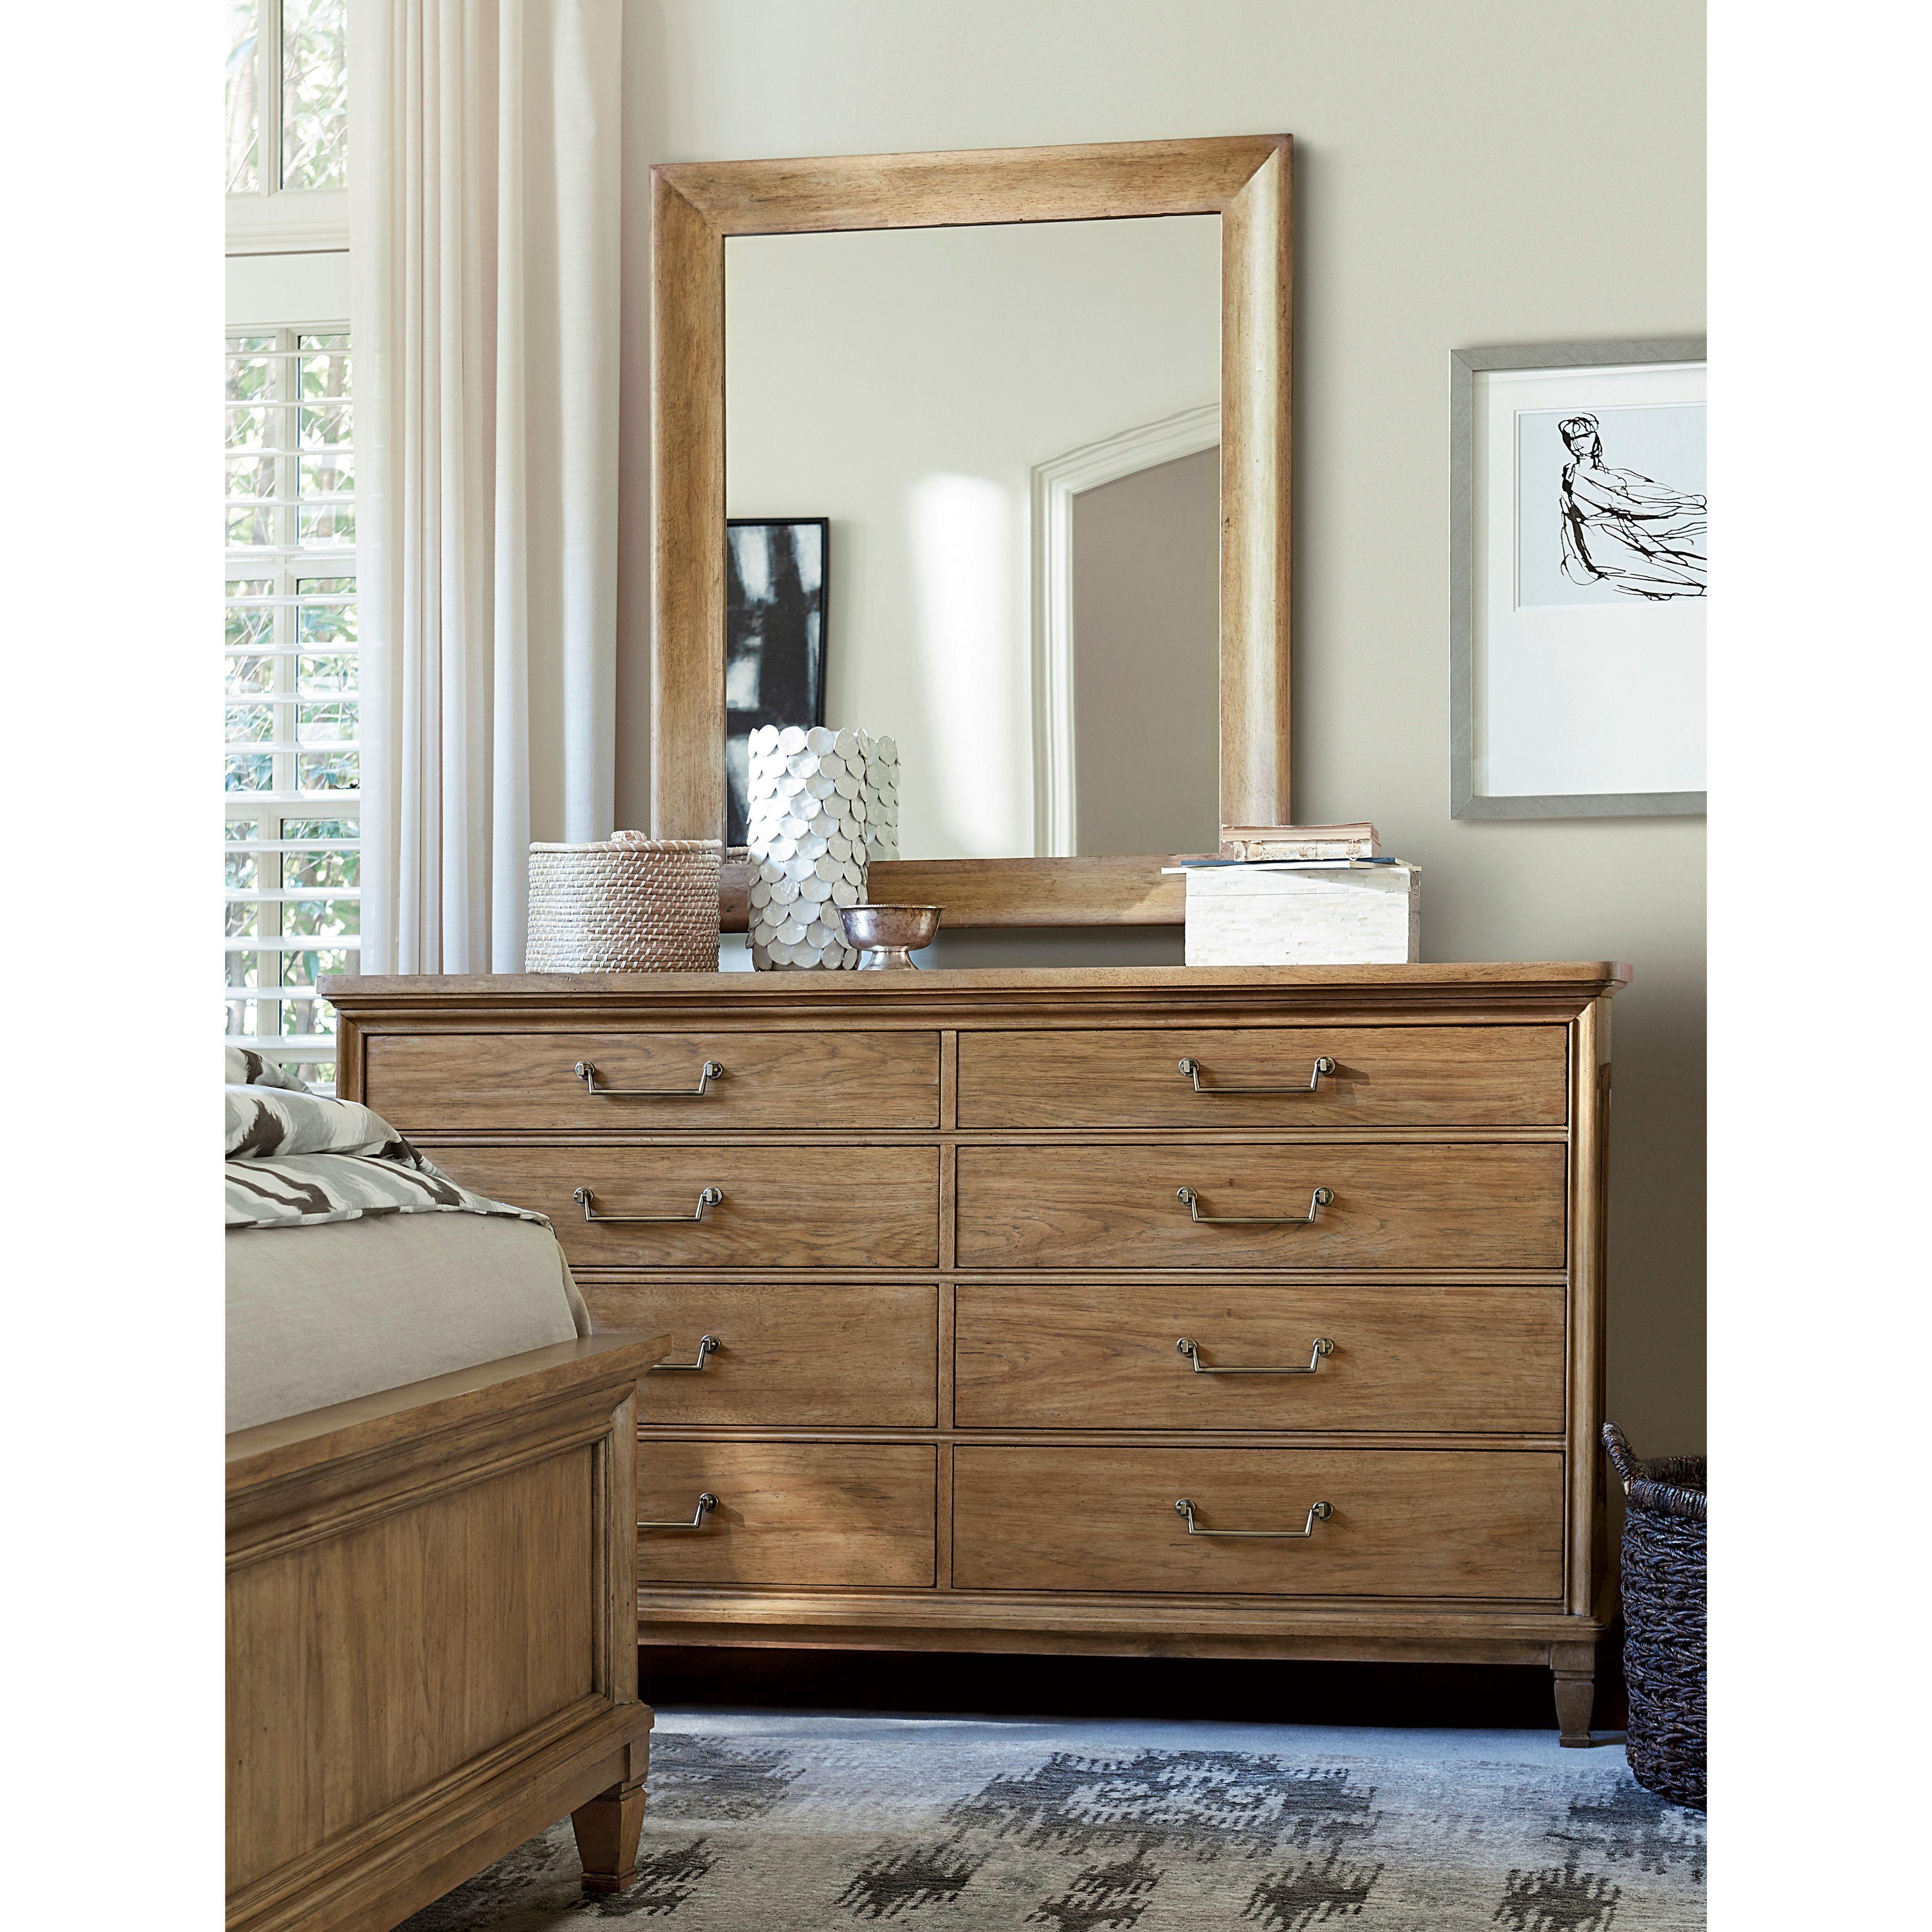 Universal Furniture Moderne Muse Dresser in Bisque Finish (Dresser), Tan, Size 8-drawer